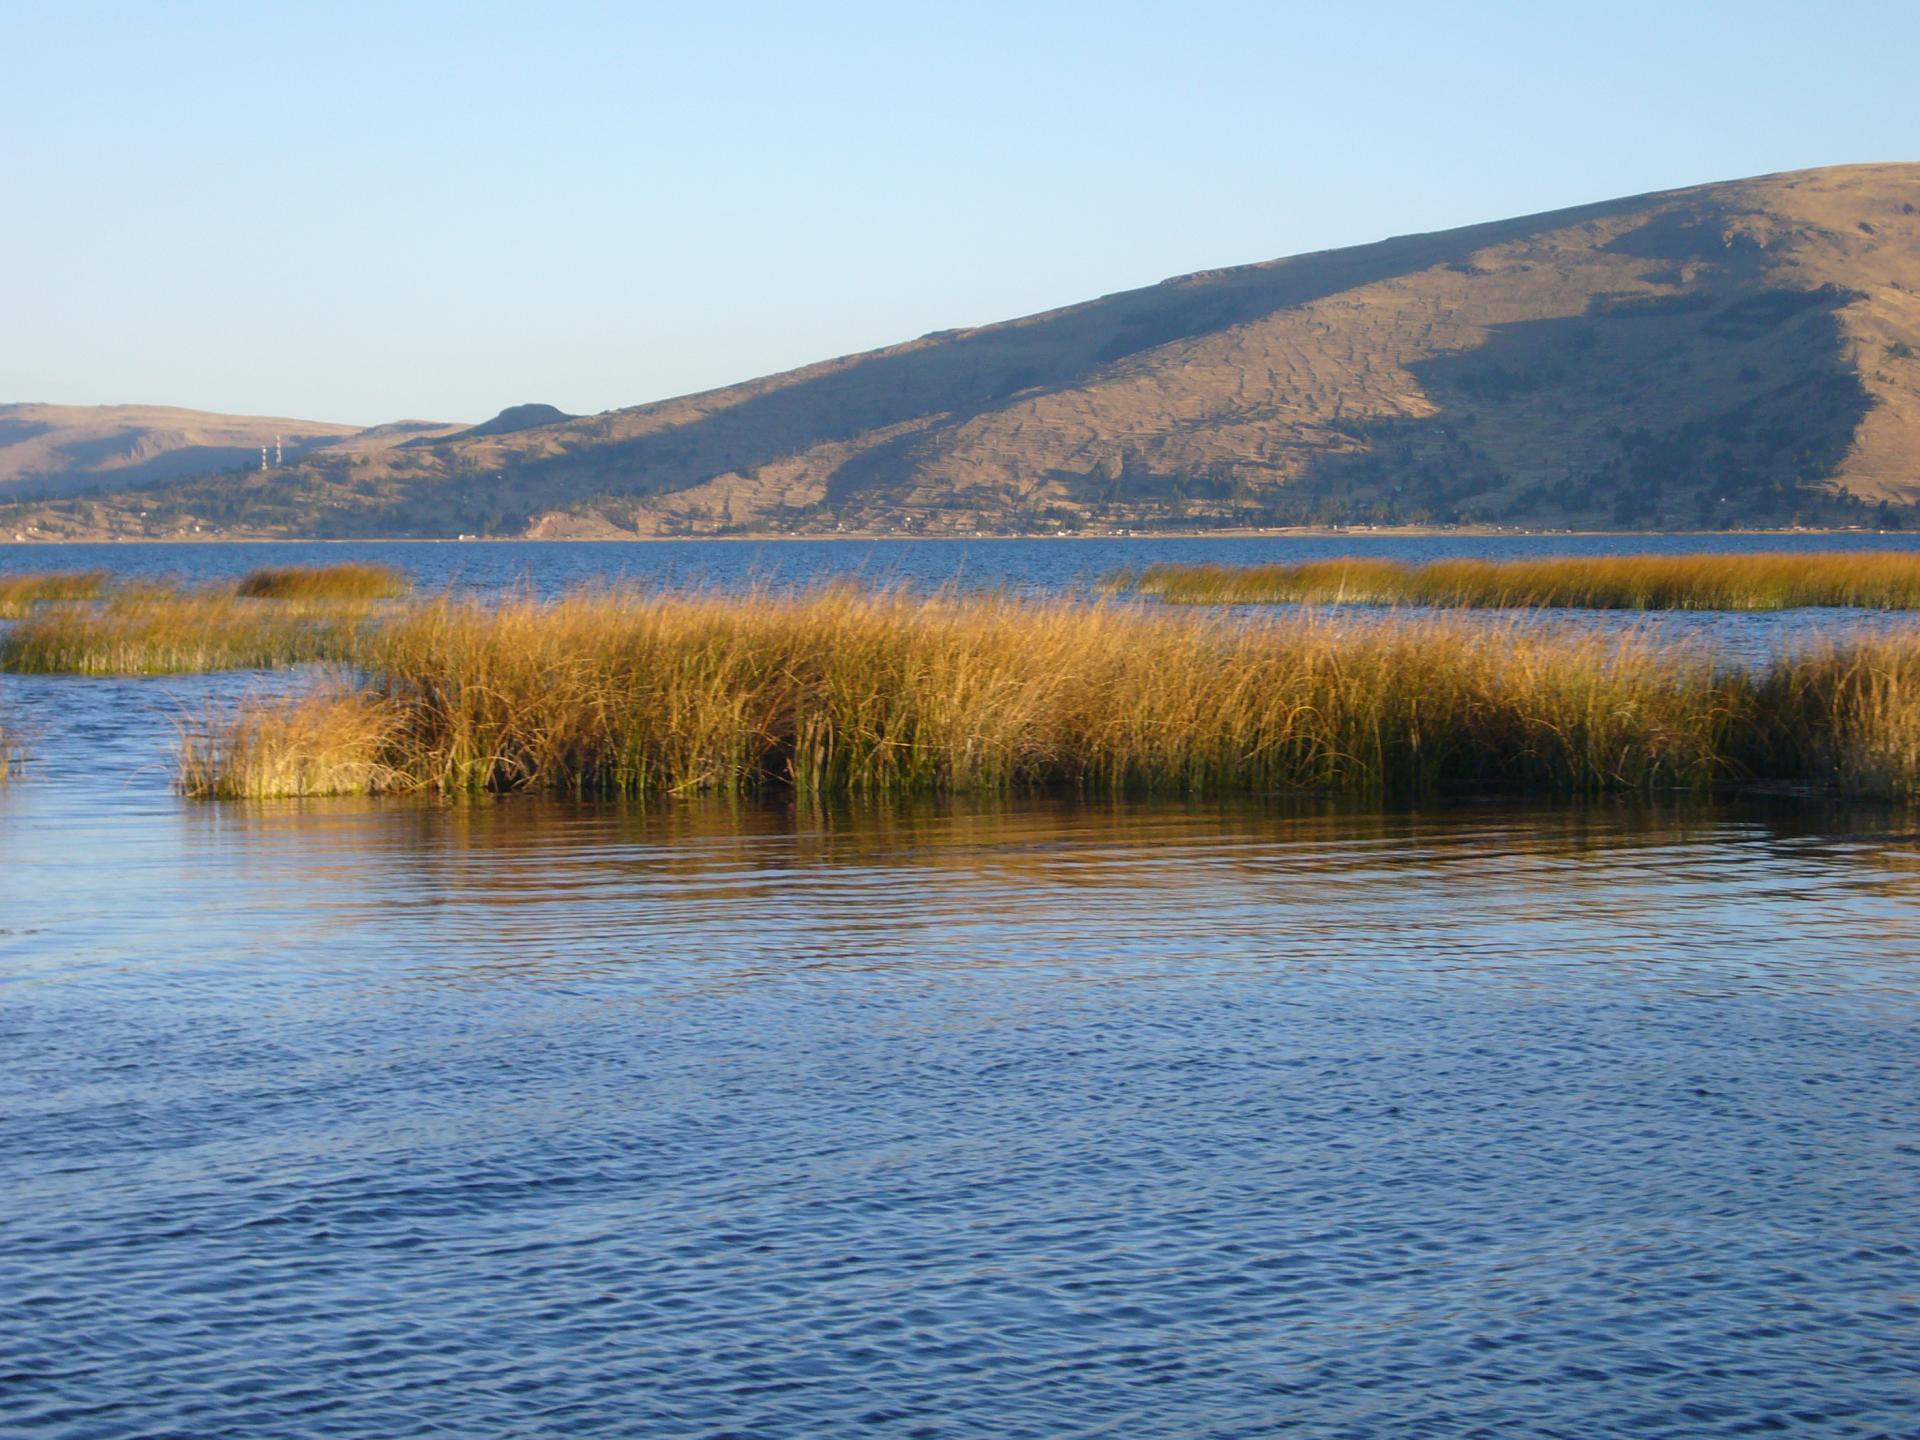 Verbringen Sie wundervolle Tage am Titicaca See in Peru